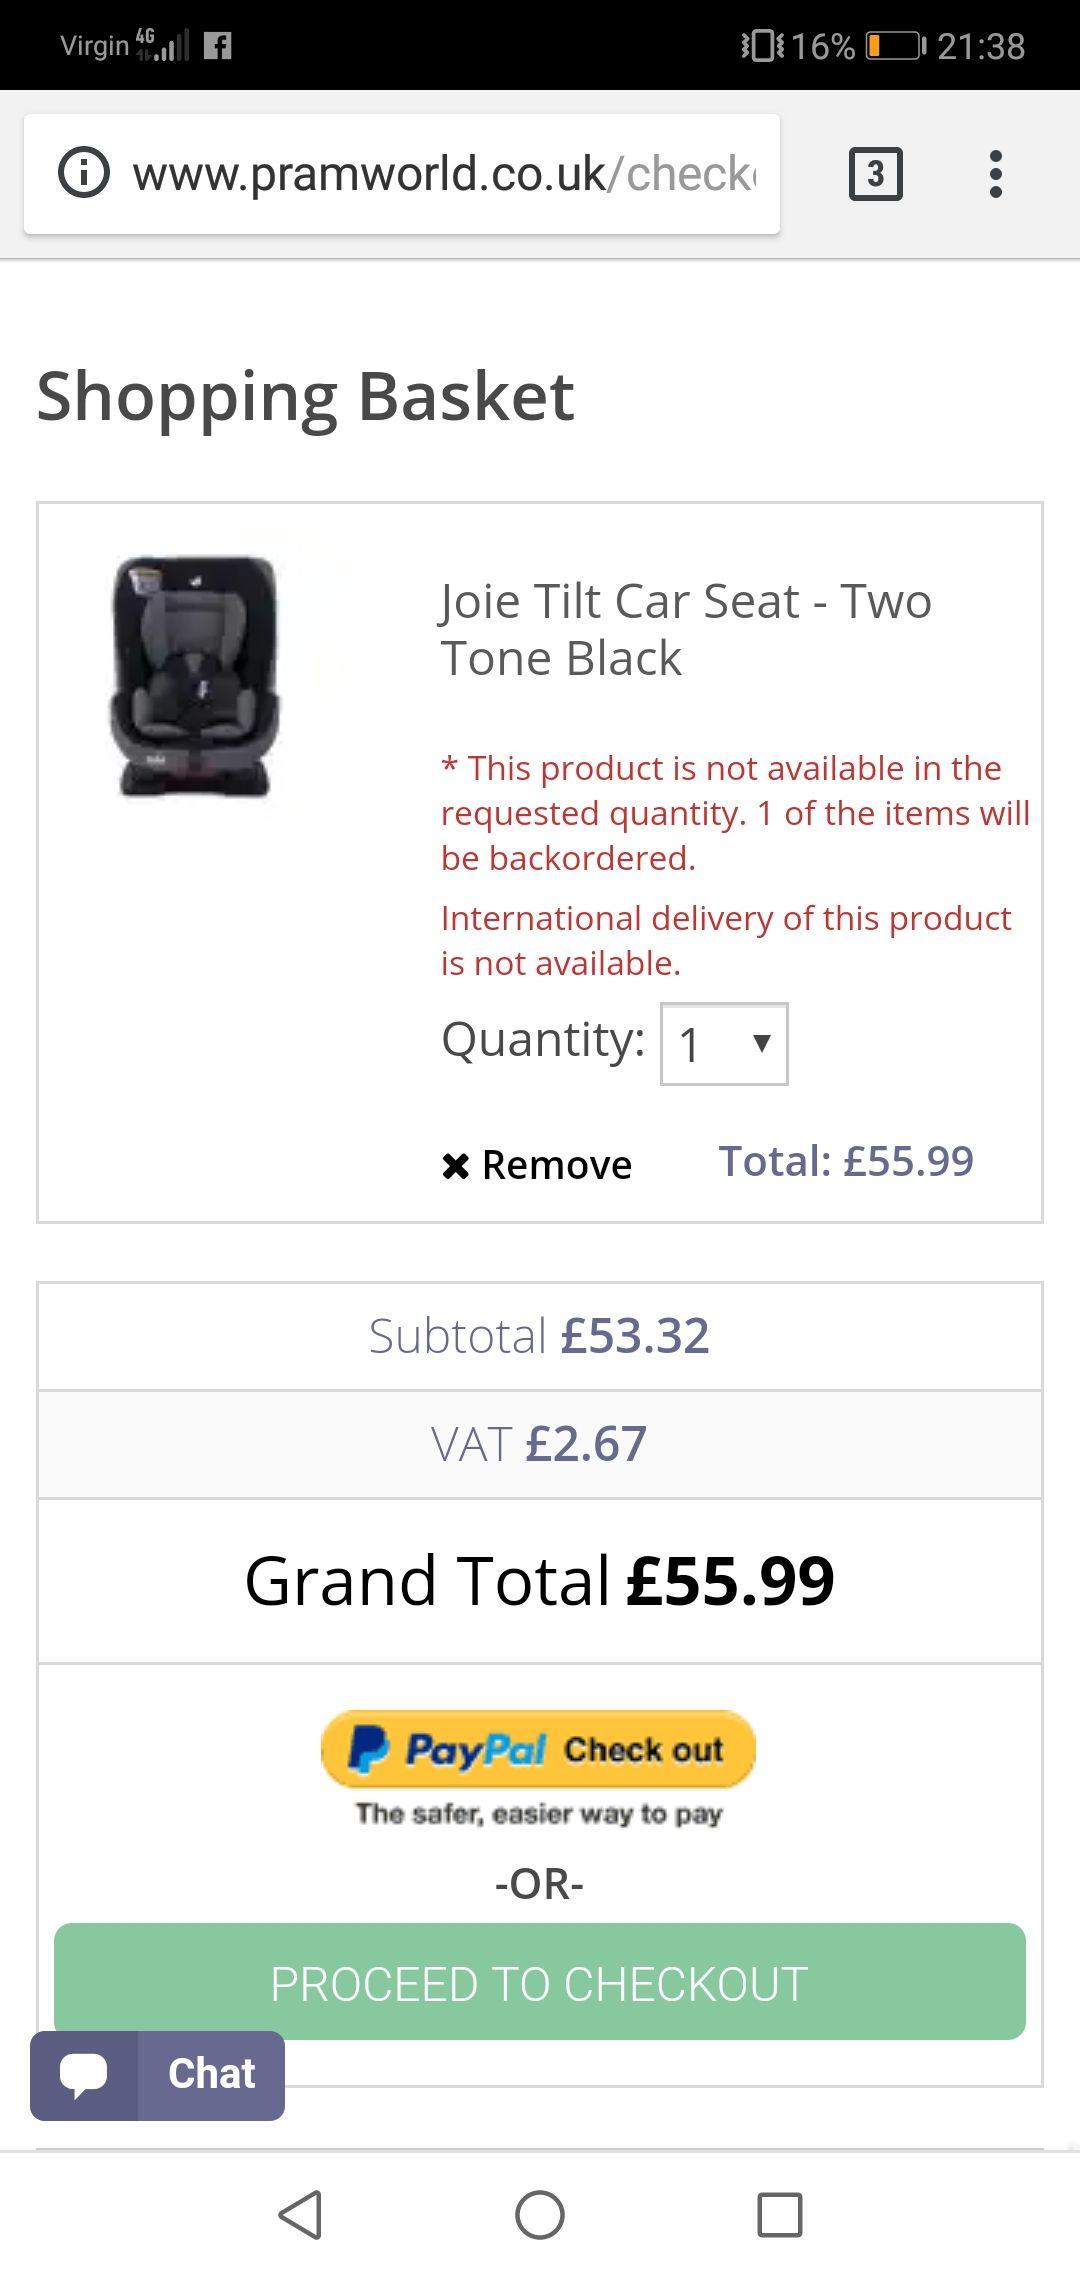 Joie Tilt Car Seat Pramworld Bargain - £55.99 @ Pramworld